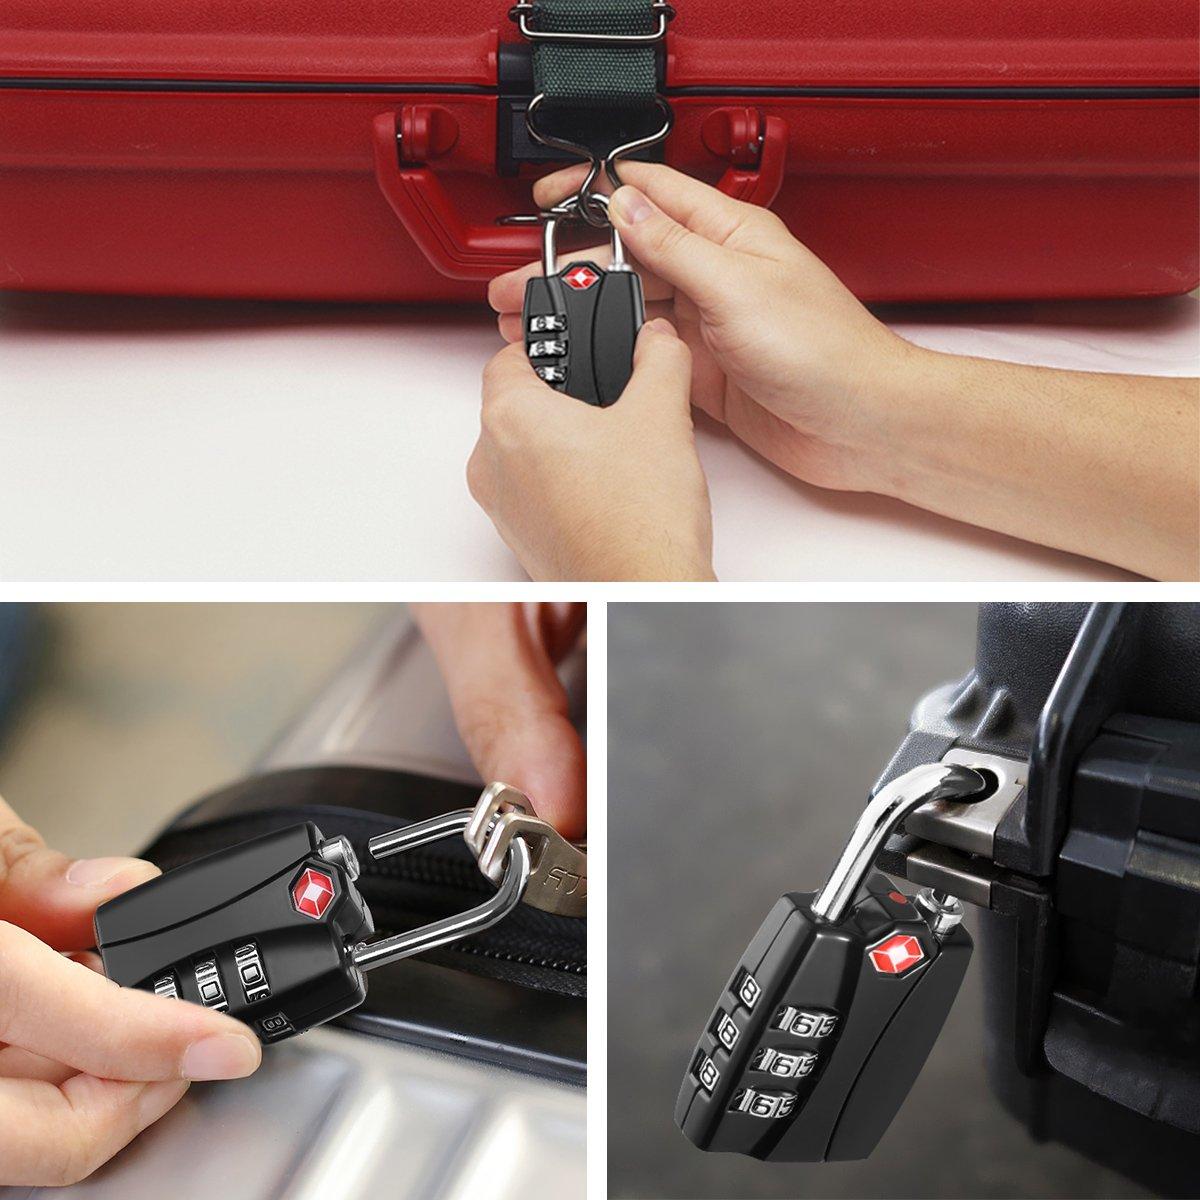 KeeKit Combination Locks, TSA Approved Luggage Locks with Open Alert Indicator, TSA Luggage Locks for Travel, Suitcase, Baggage & Backpack, Gym Locker (Black, 2 Pack) by KeeKit (Image #7)